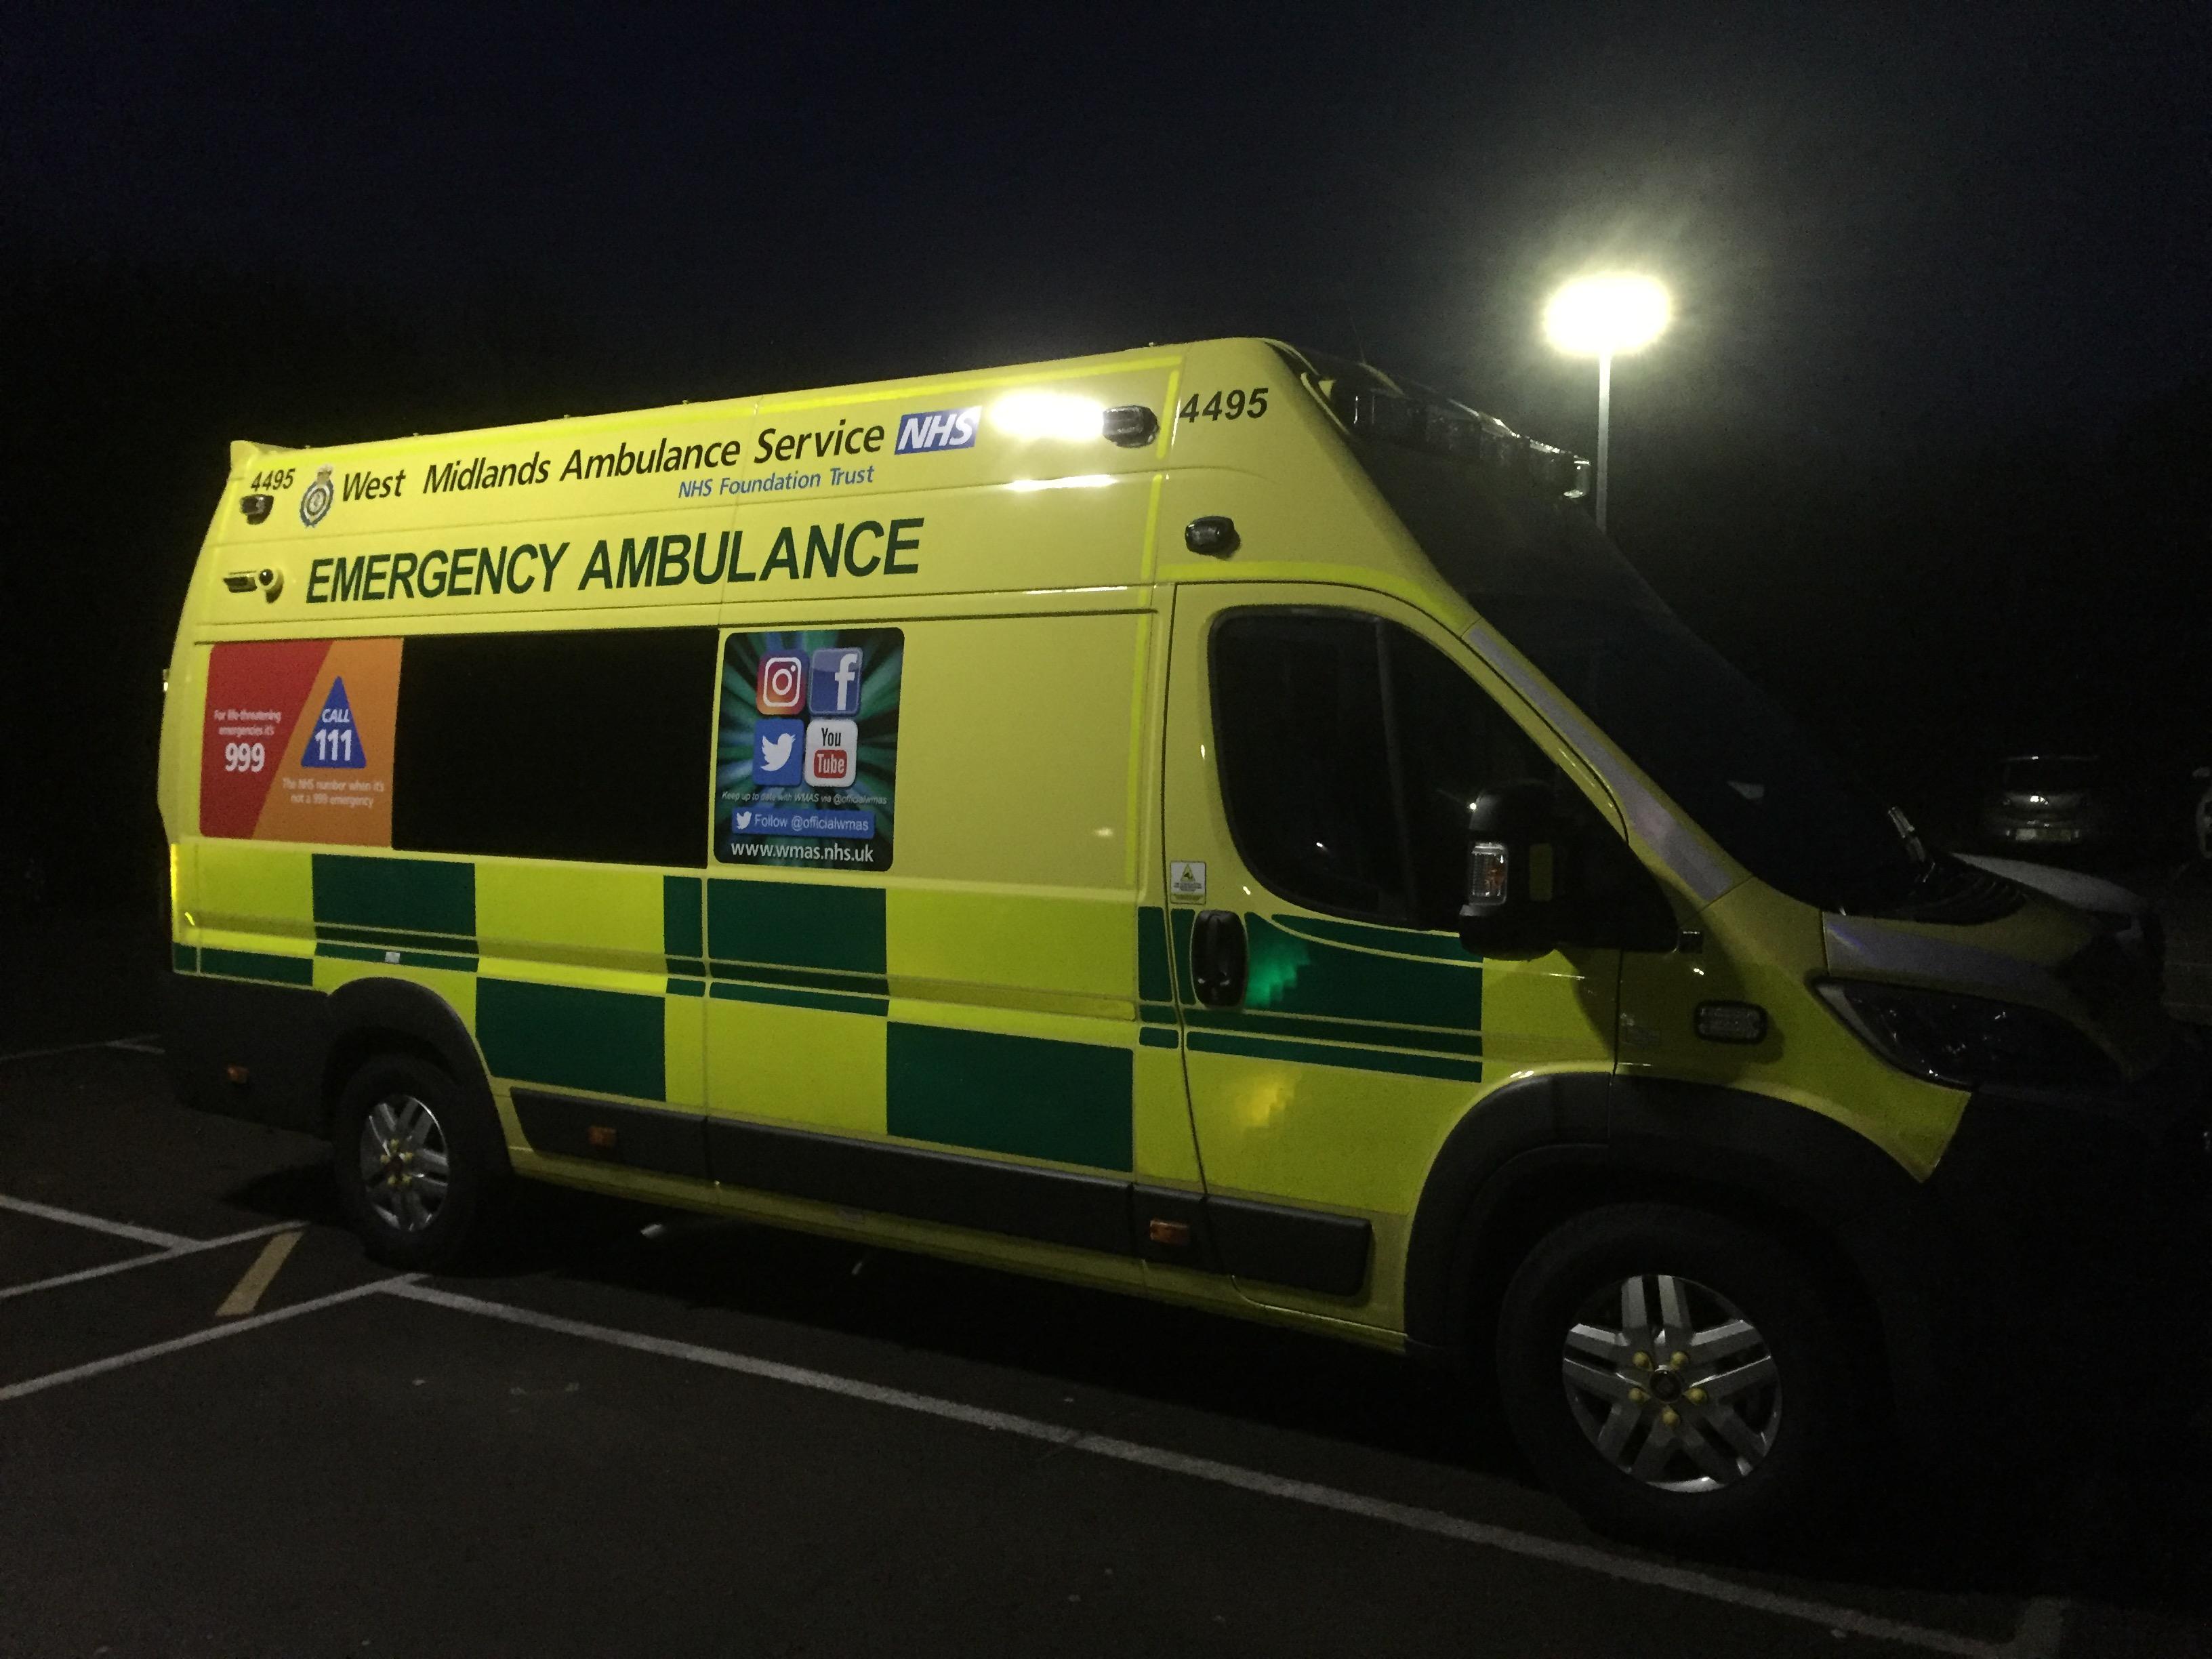 May 2017 West Midlands Ambulance Service Nhs Foundation